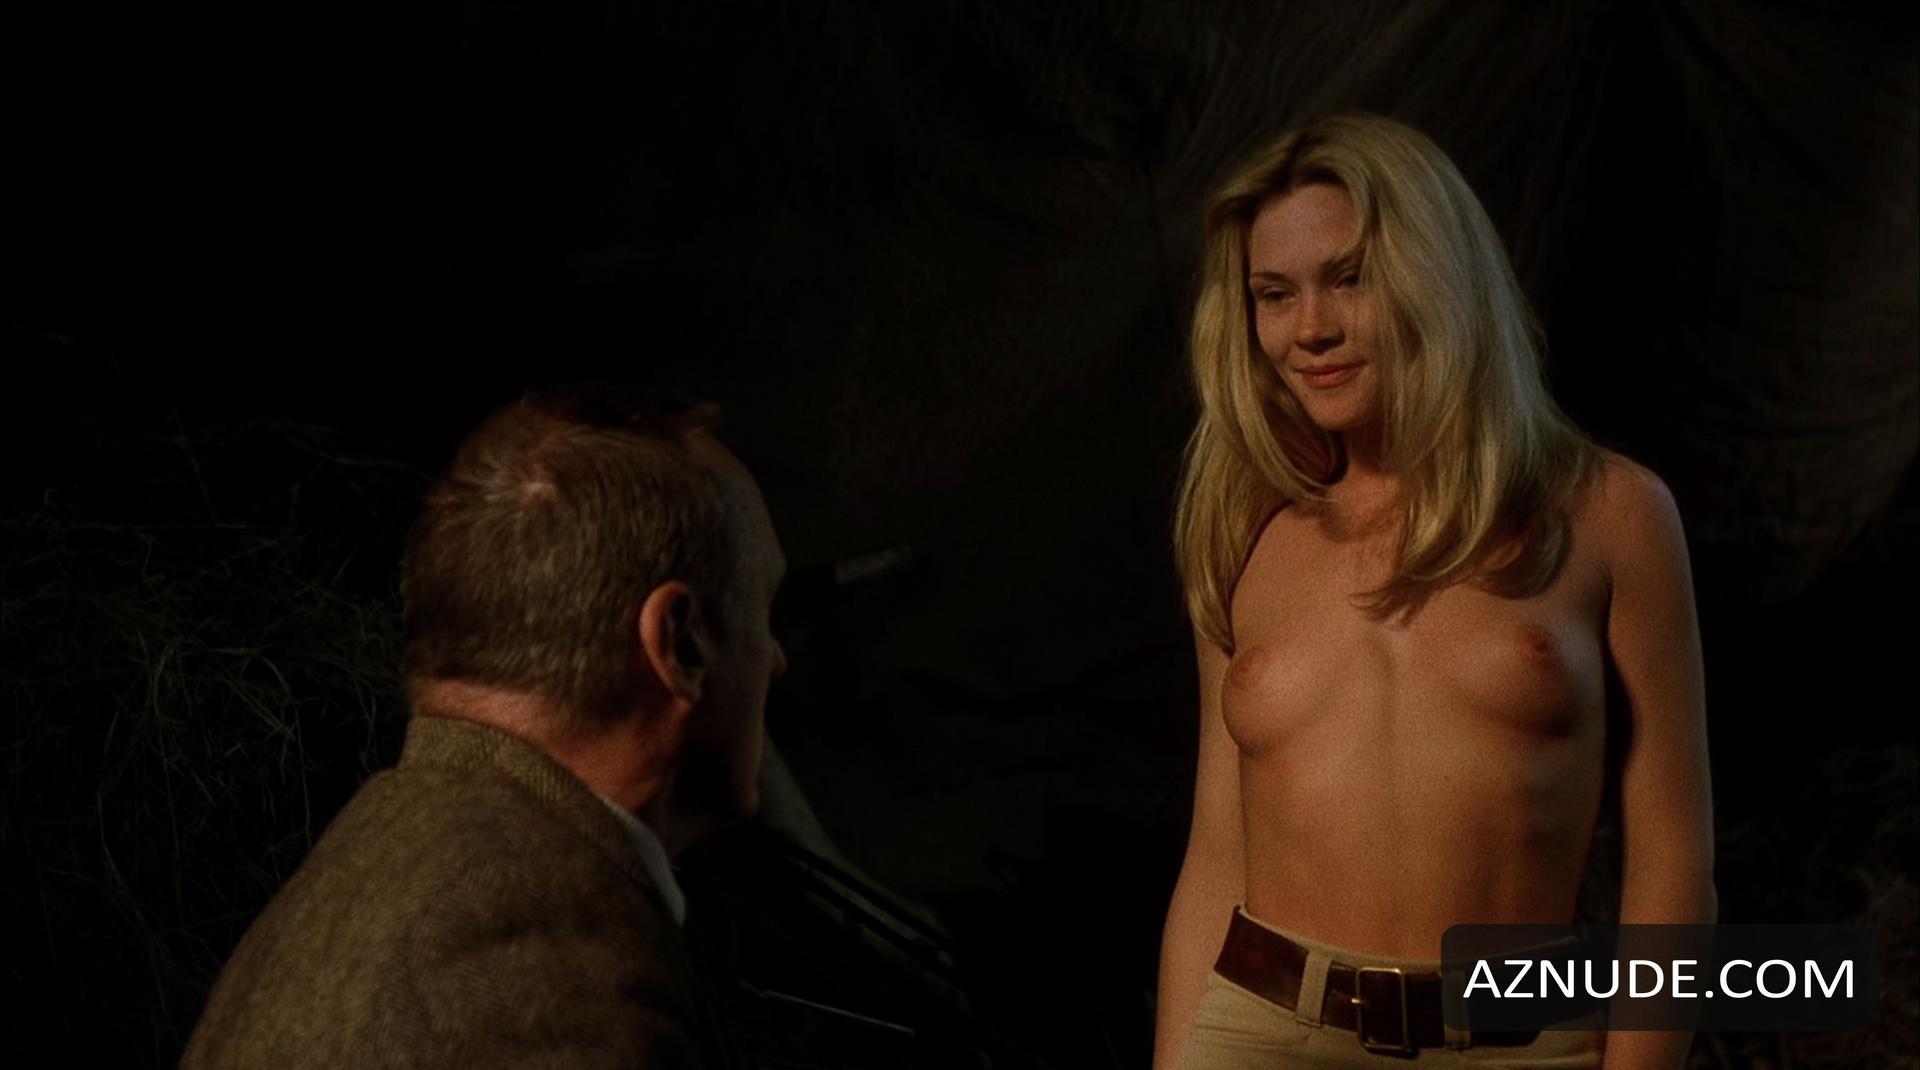 Anatomy of a nude scene